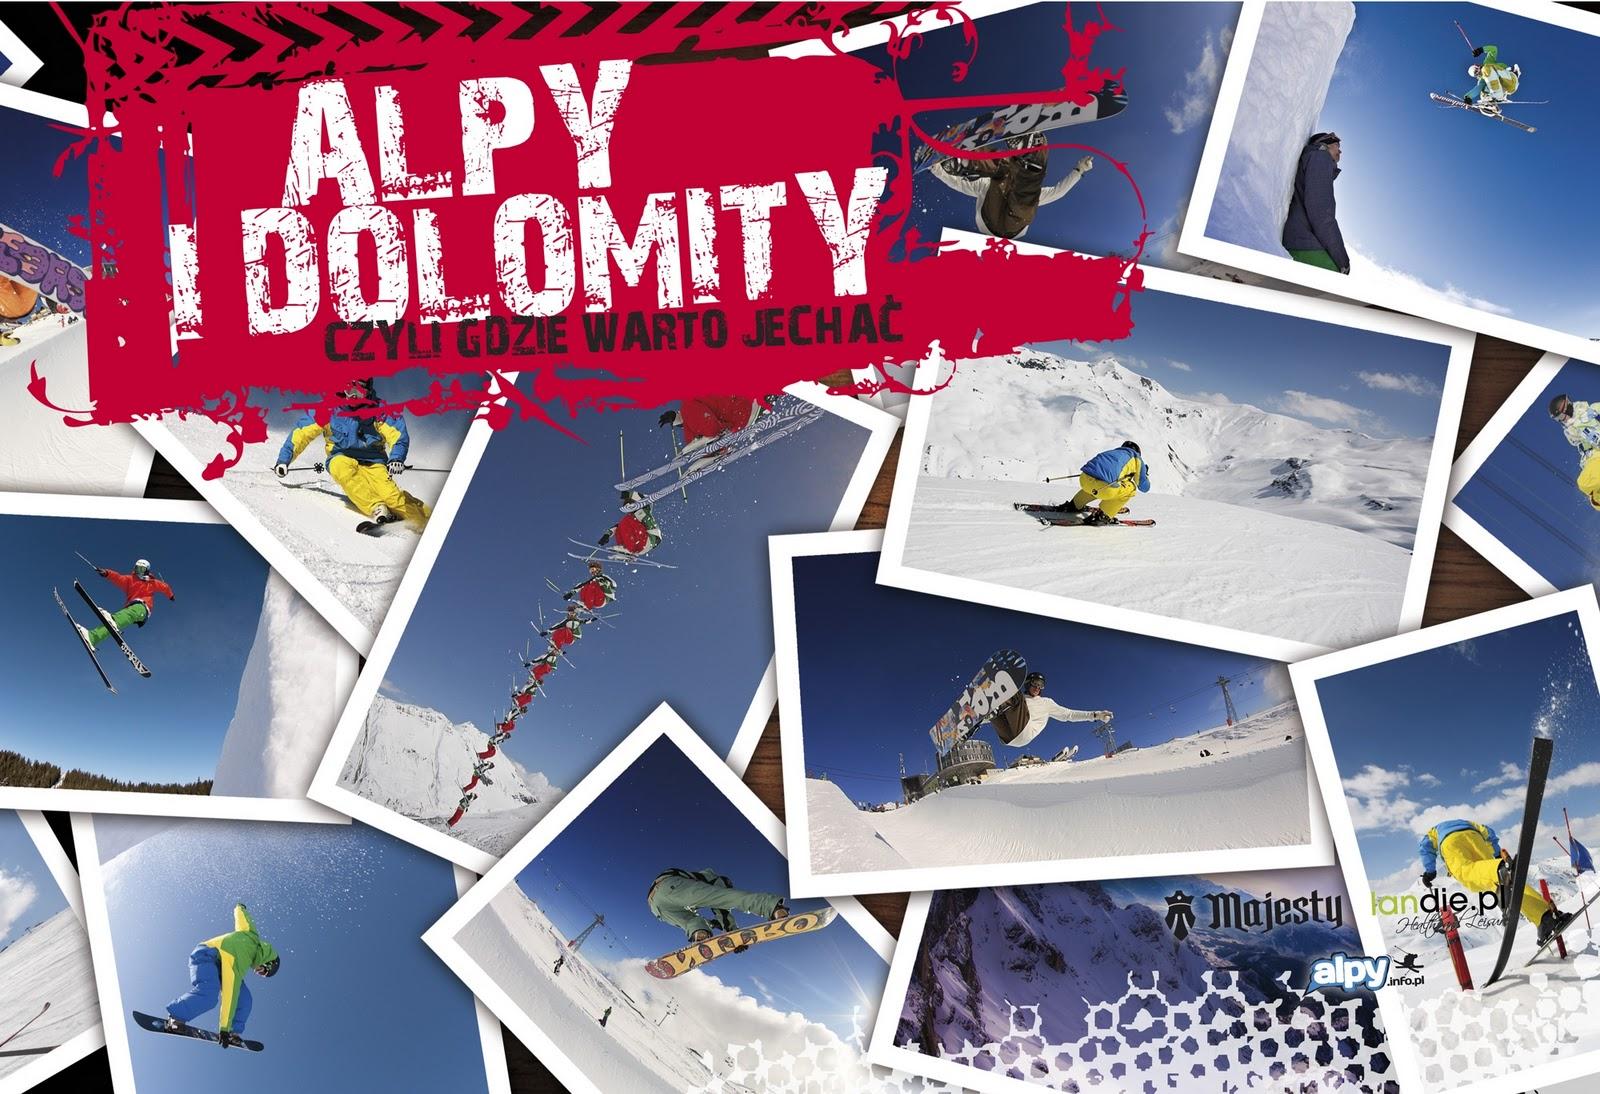 http://2.bp.blogspot.com/_sFsa_4DfagI/TMmSLppq9MI/AAAAAAAAGOg/yeLHjkL7LcU/s1600/Alpy+i+Dolomity,+czyli+gdzie+warto+jecha%C4%87+-+ebook.JPG